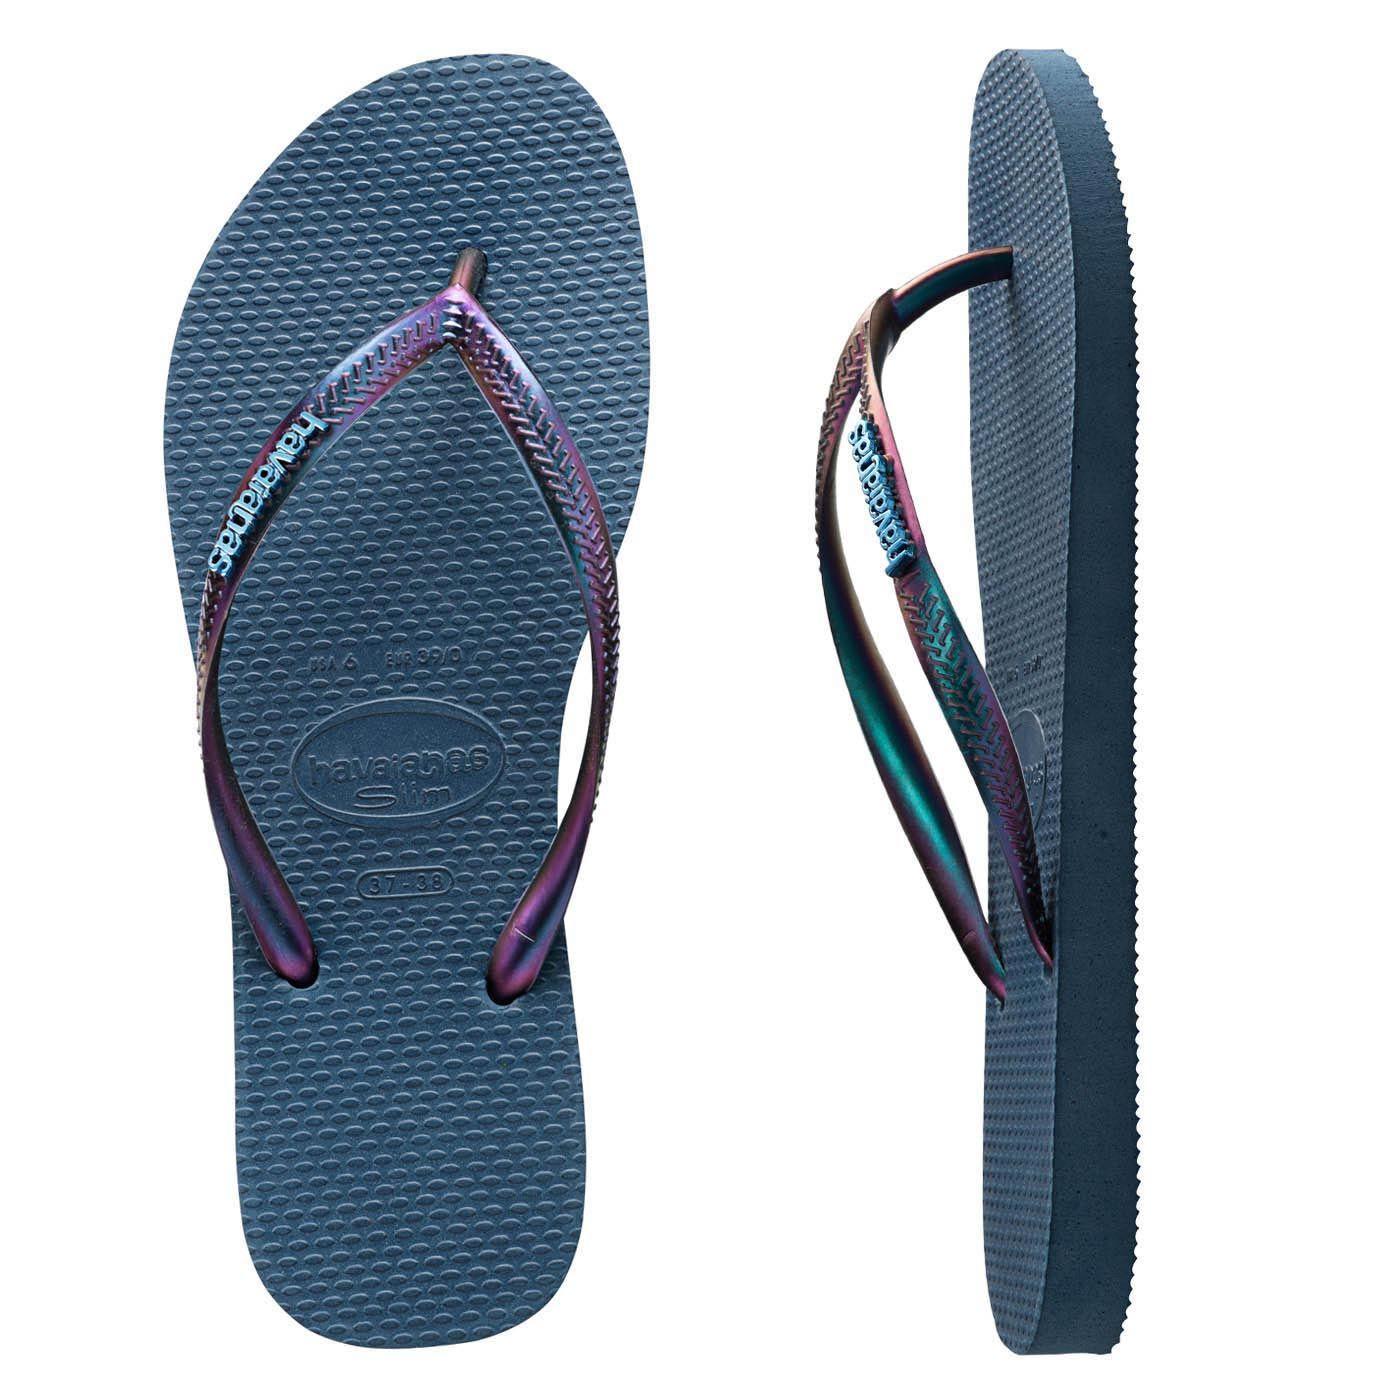 df747338b Flip Flops · Metallic · Outfit · Havaianas Slim Furta Cor Indigo Blue  Thongs. Classic Indigo blue Havaianas featuring a duo metallic